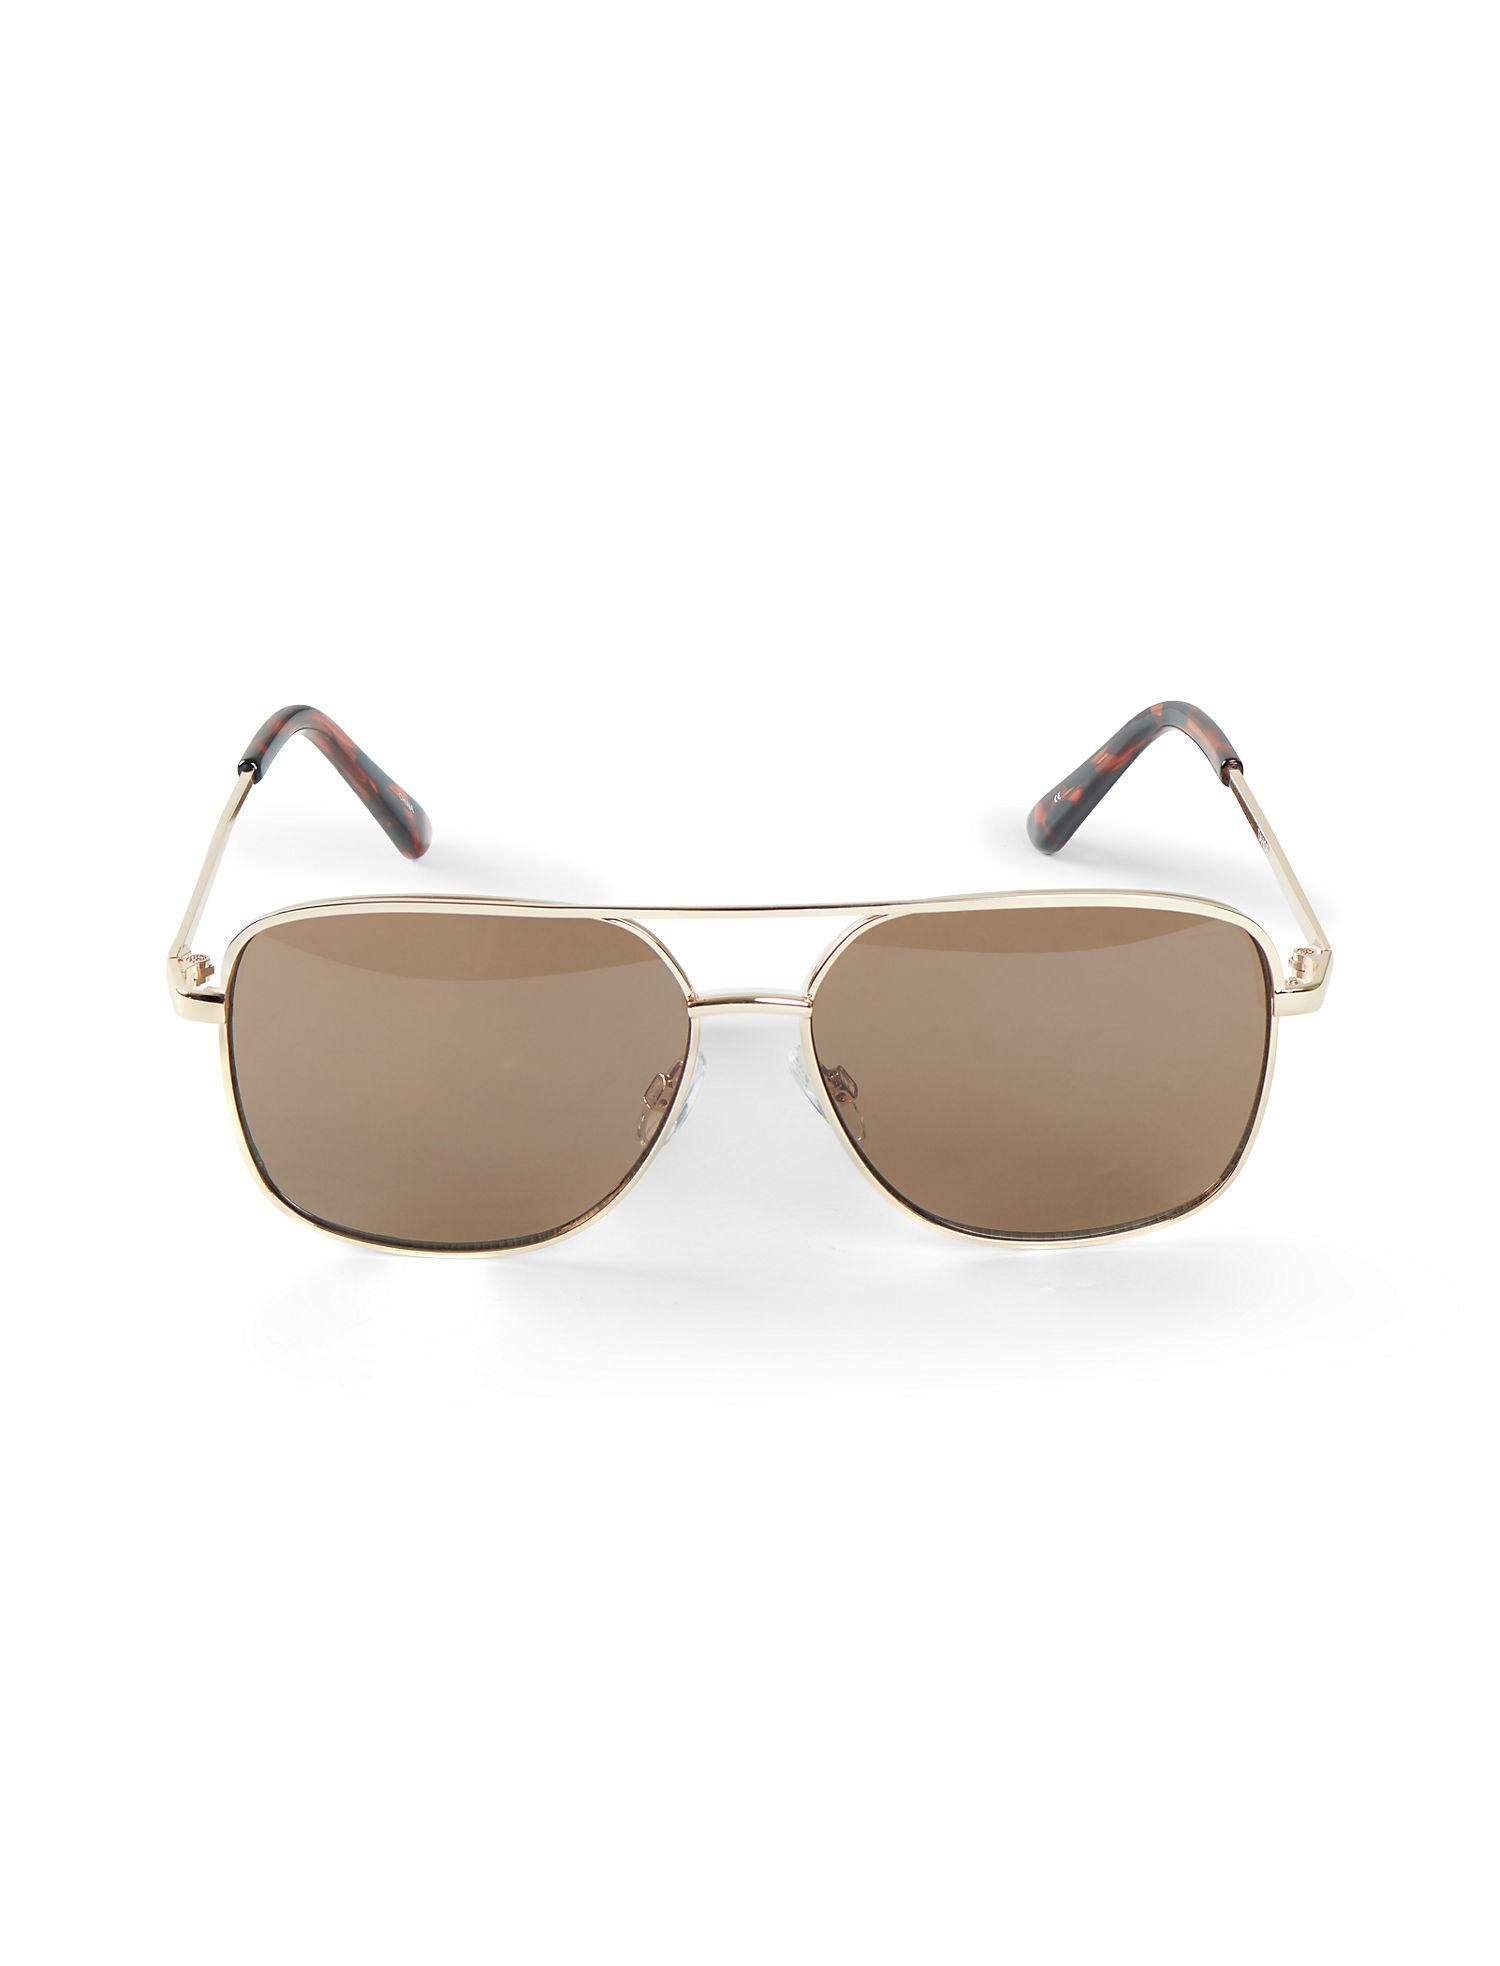 913cfbc245c48 Lyst - Lucky Brand Tahoe Sunglasses in Metallic